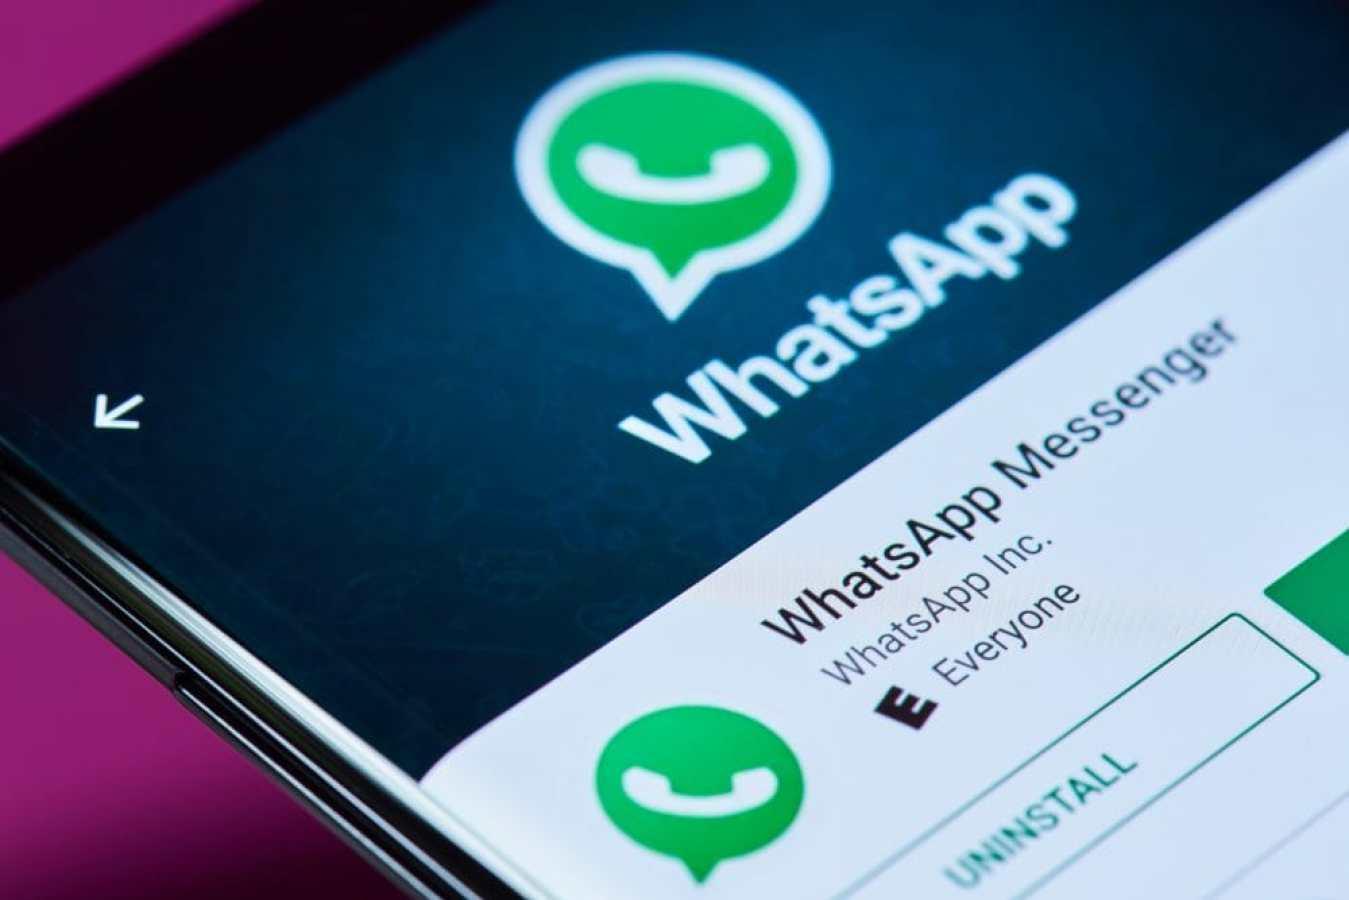 whatsapp Copyright: dimarik16 / 123RF Stock Photo. Social media platforms like WhatsApp are major vectors for the spread of misinformation about COVID-19. Image credit: dimarik16 / 123RF